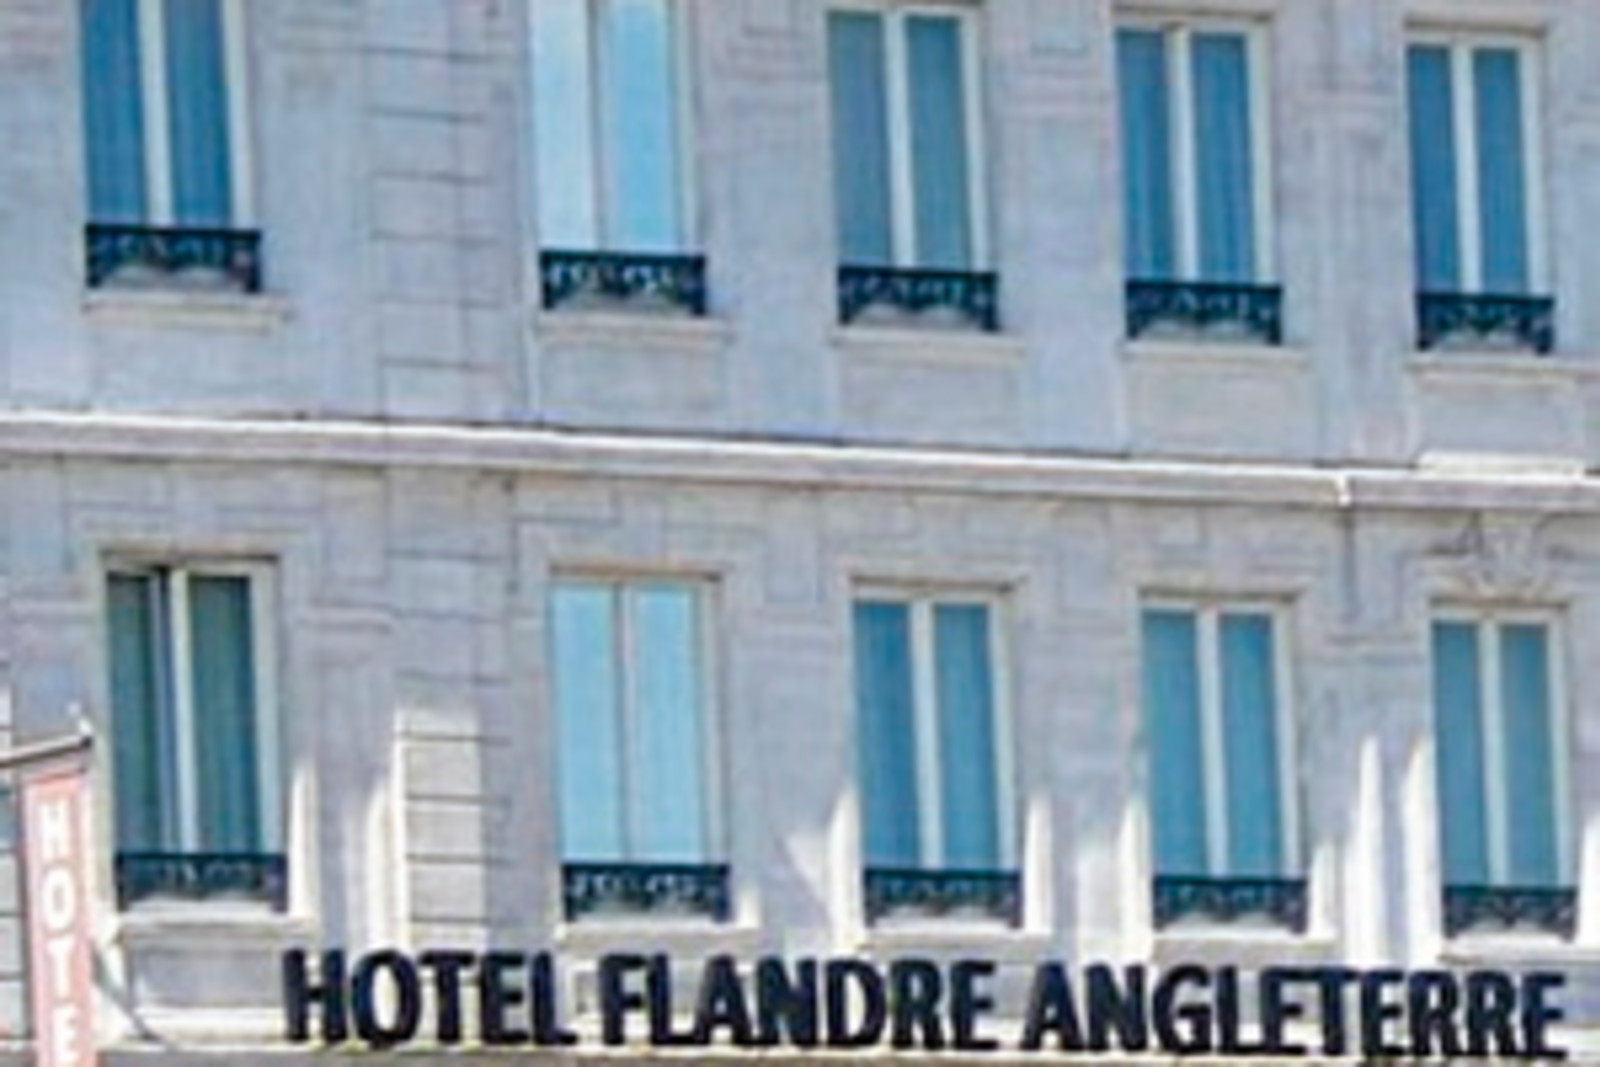 S jour gourmand pour 2 l 39 h tel d 39 angleterre salon de for Hotel d angleterre salon de provence